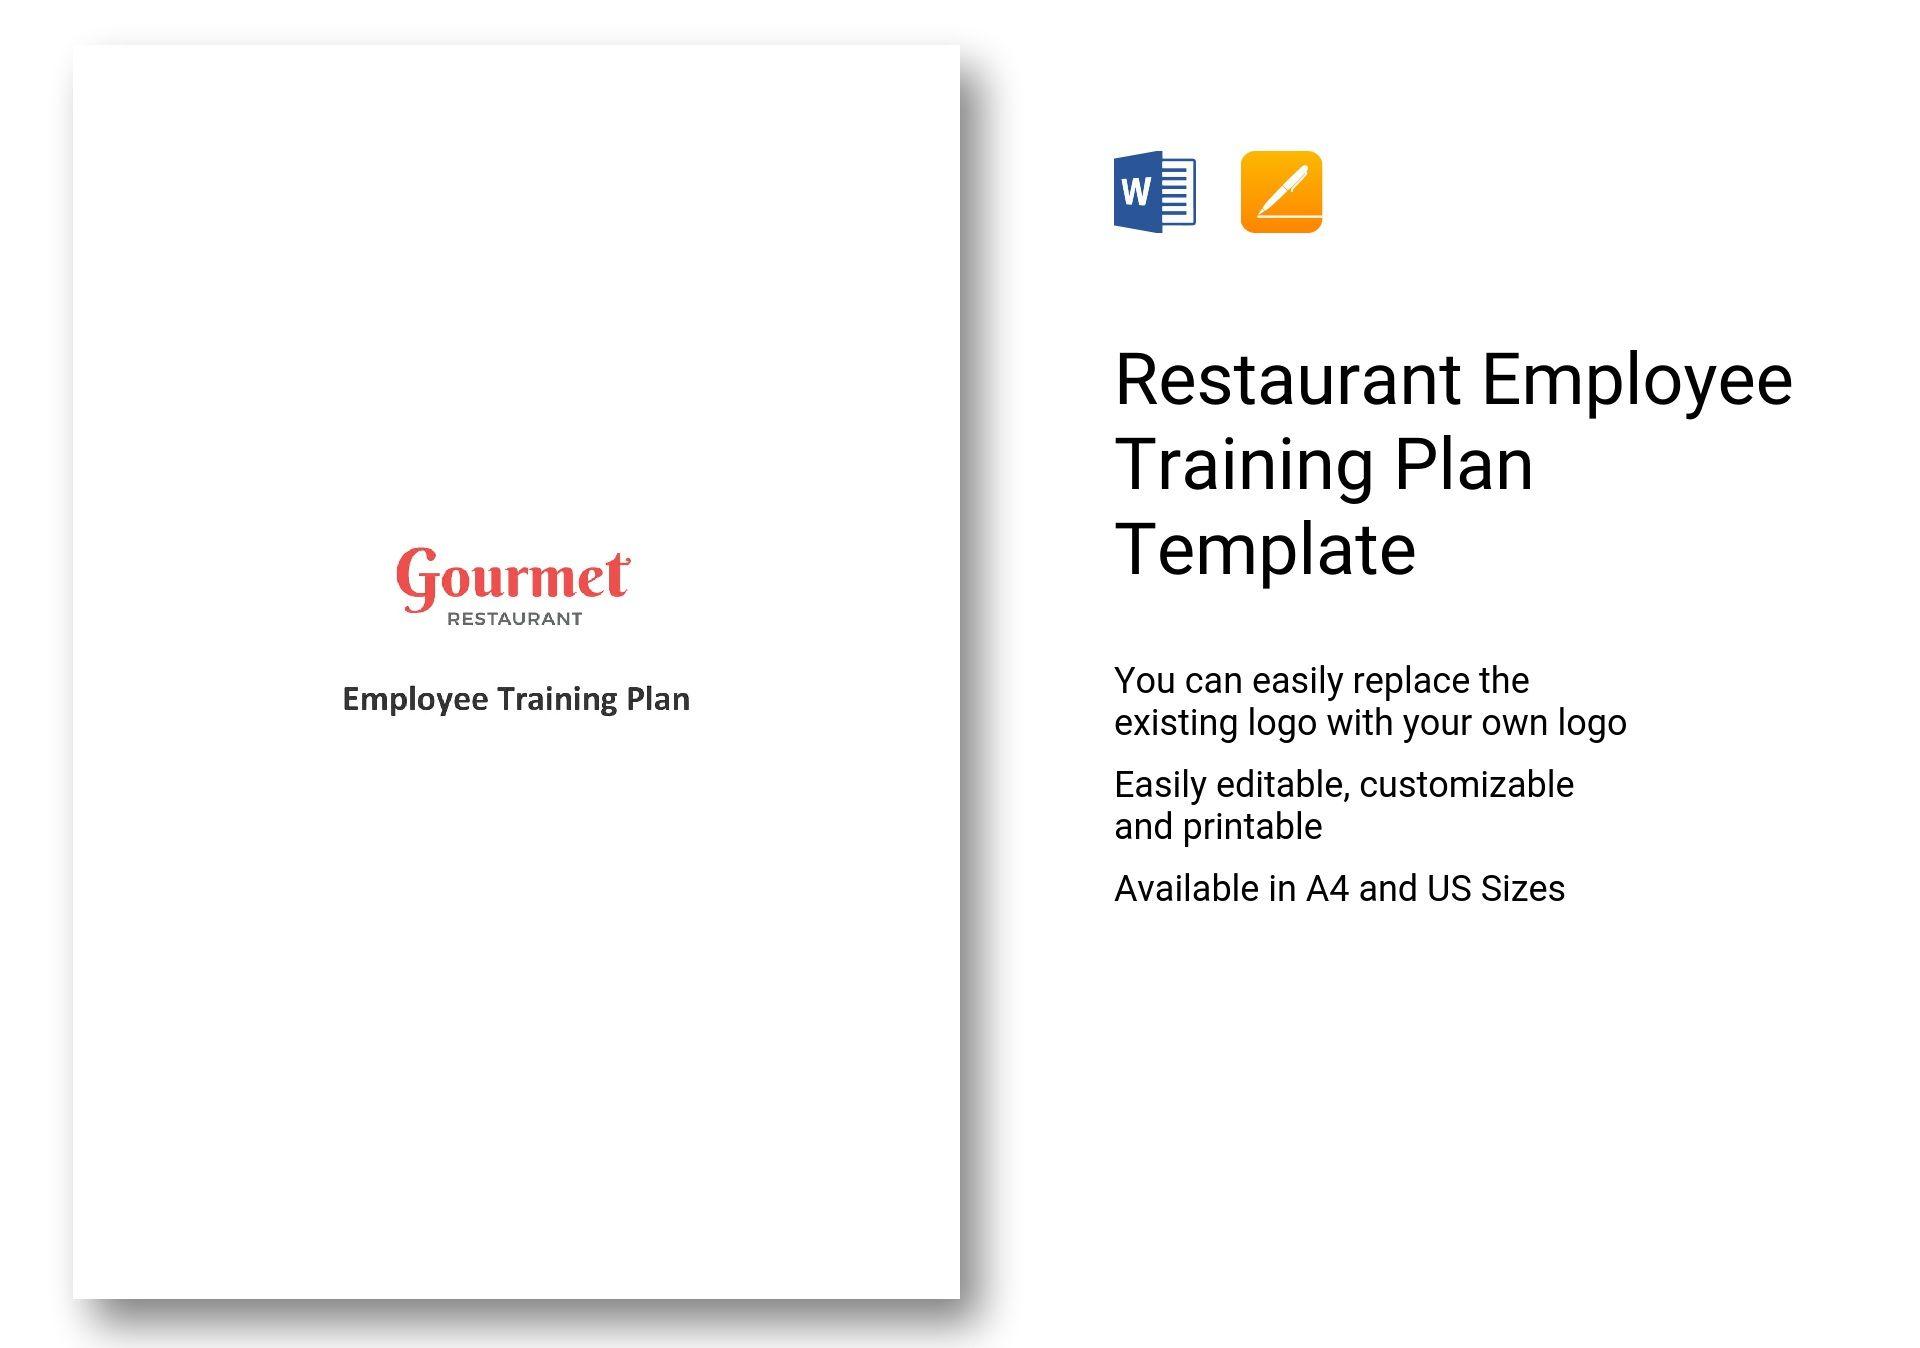 Restaurant Employee Training Plan